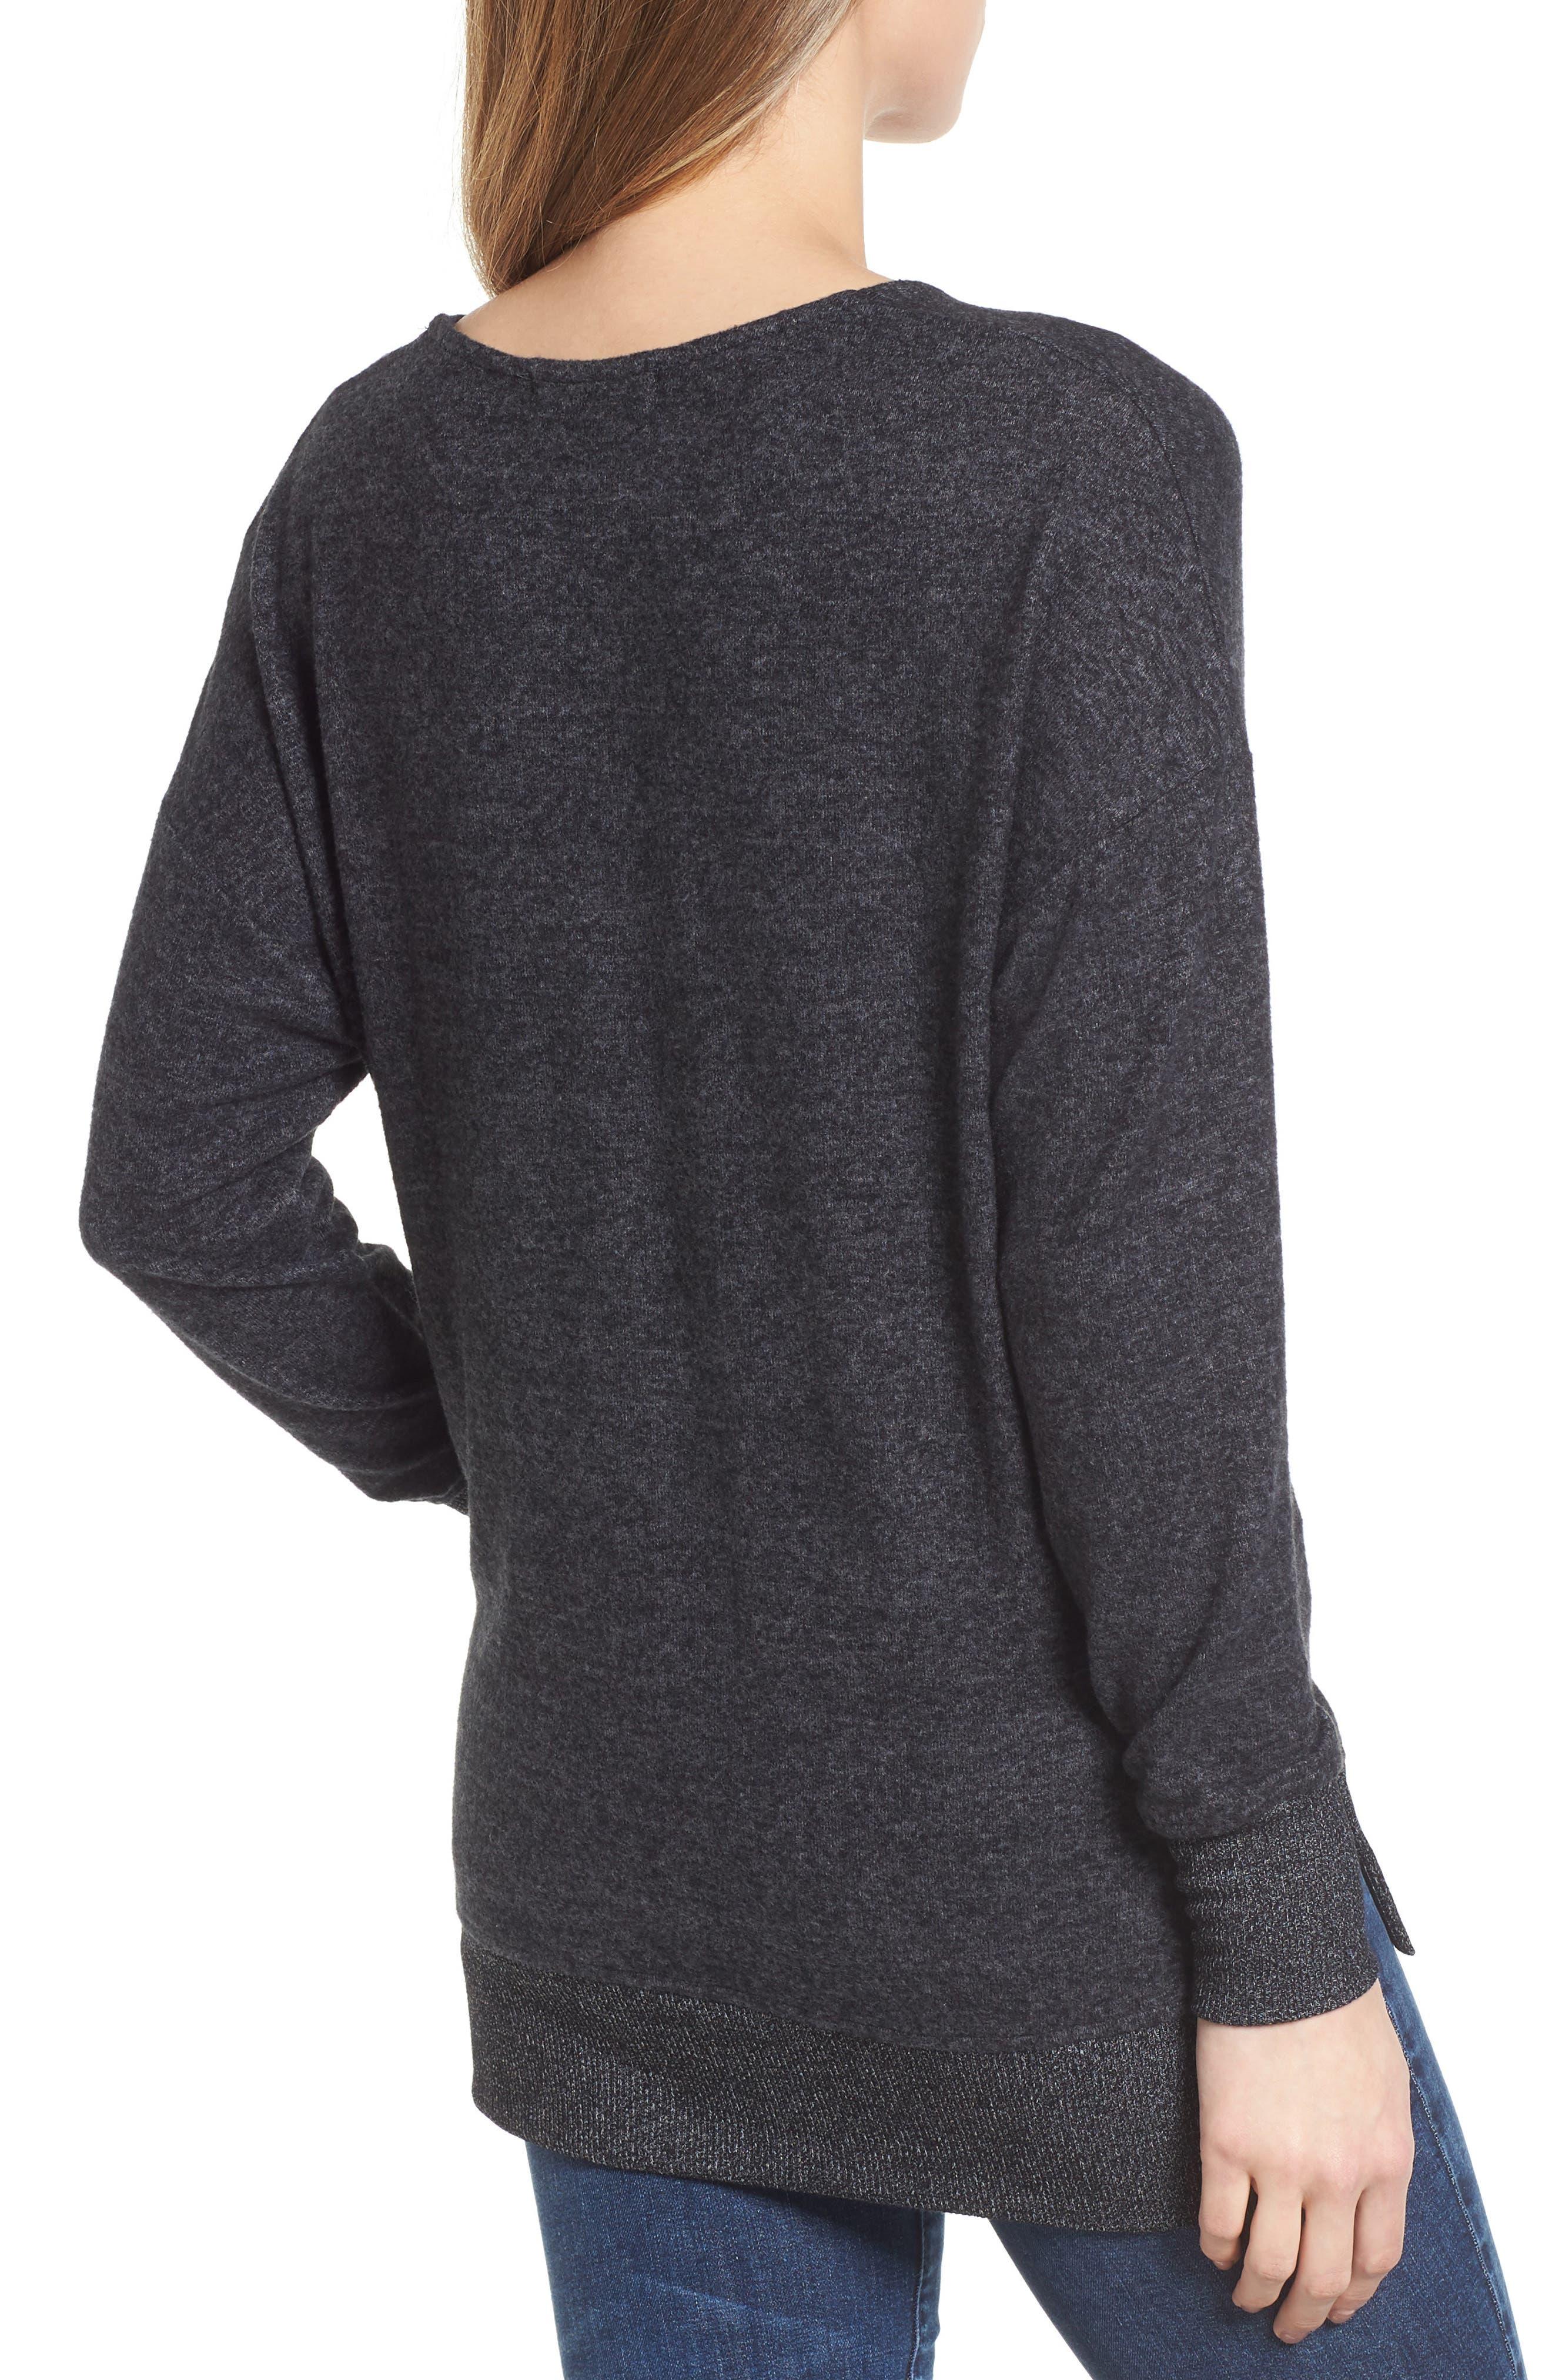 Cozy Sweatshirt,                             Alternate thumbnail 2, color,                             BLACK